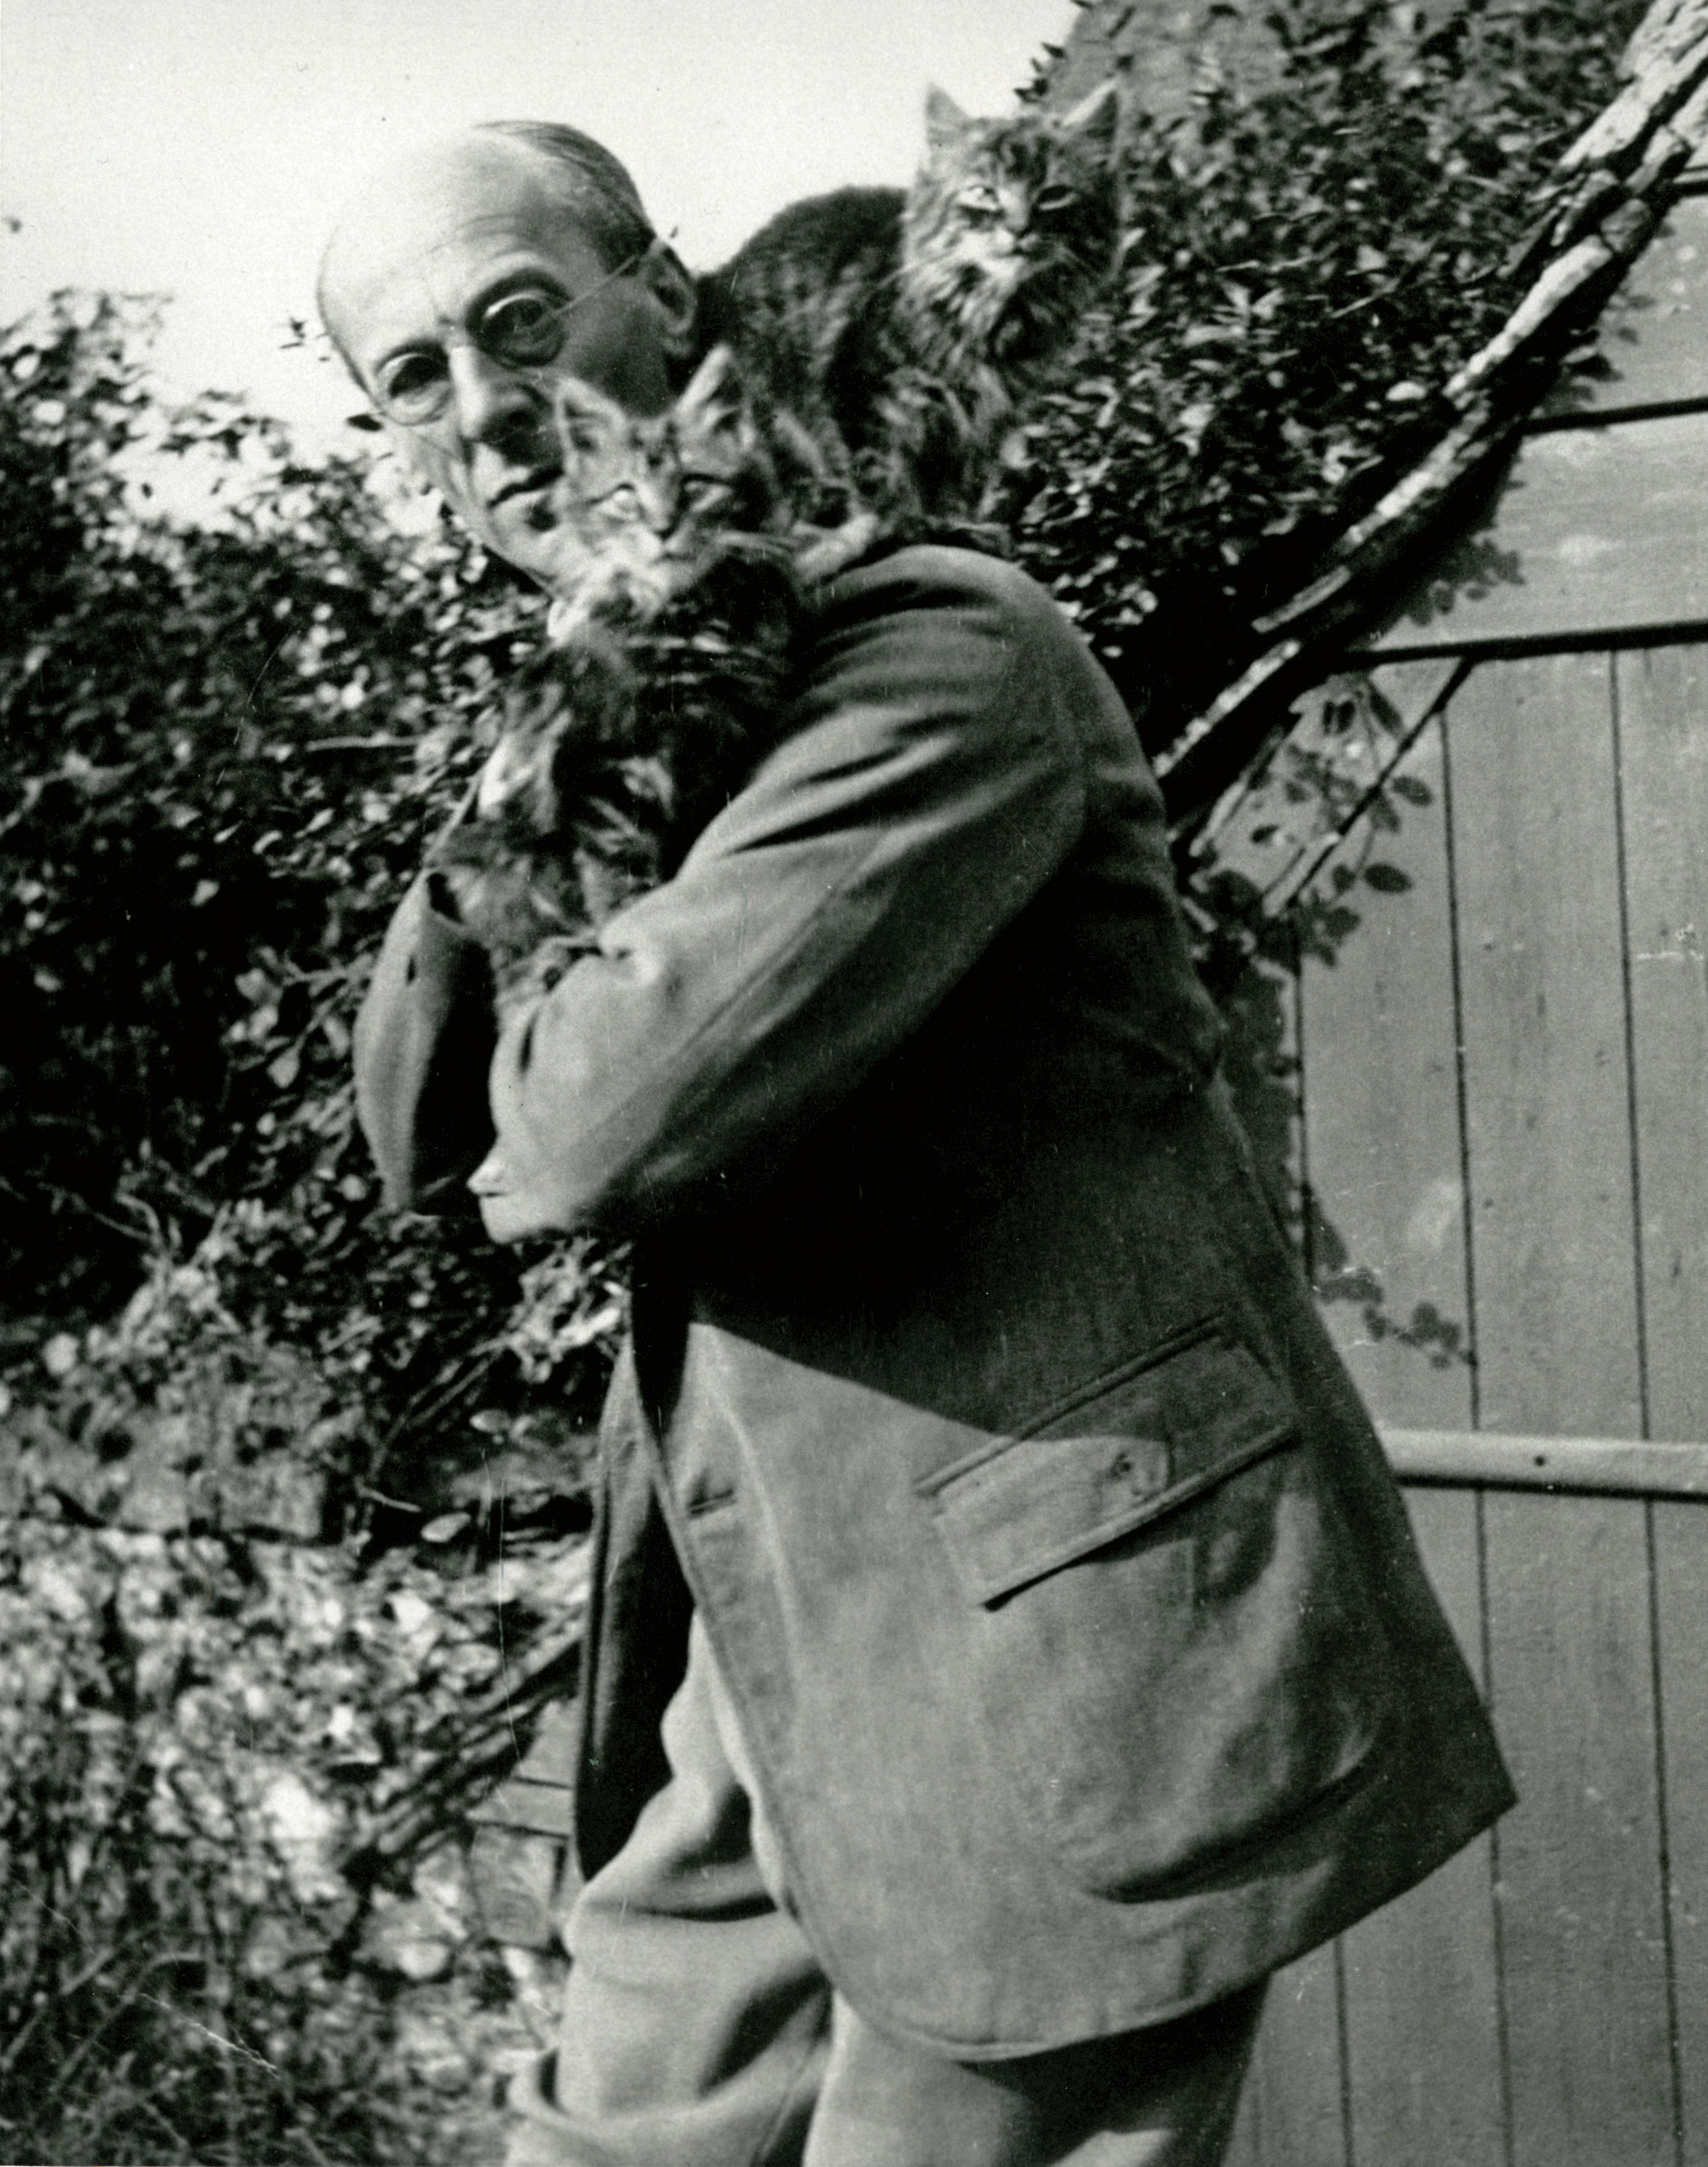 Artist Arthur Rackham and his cats.